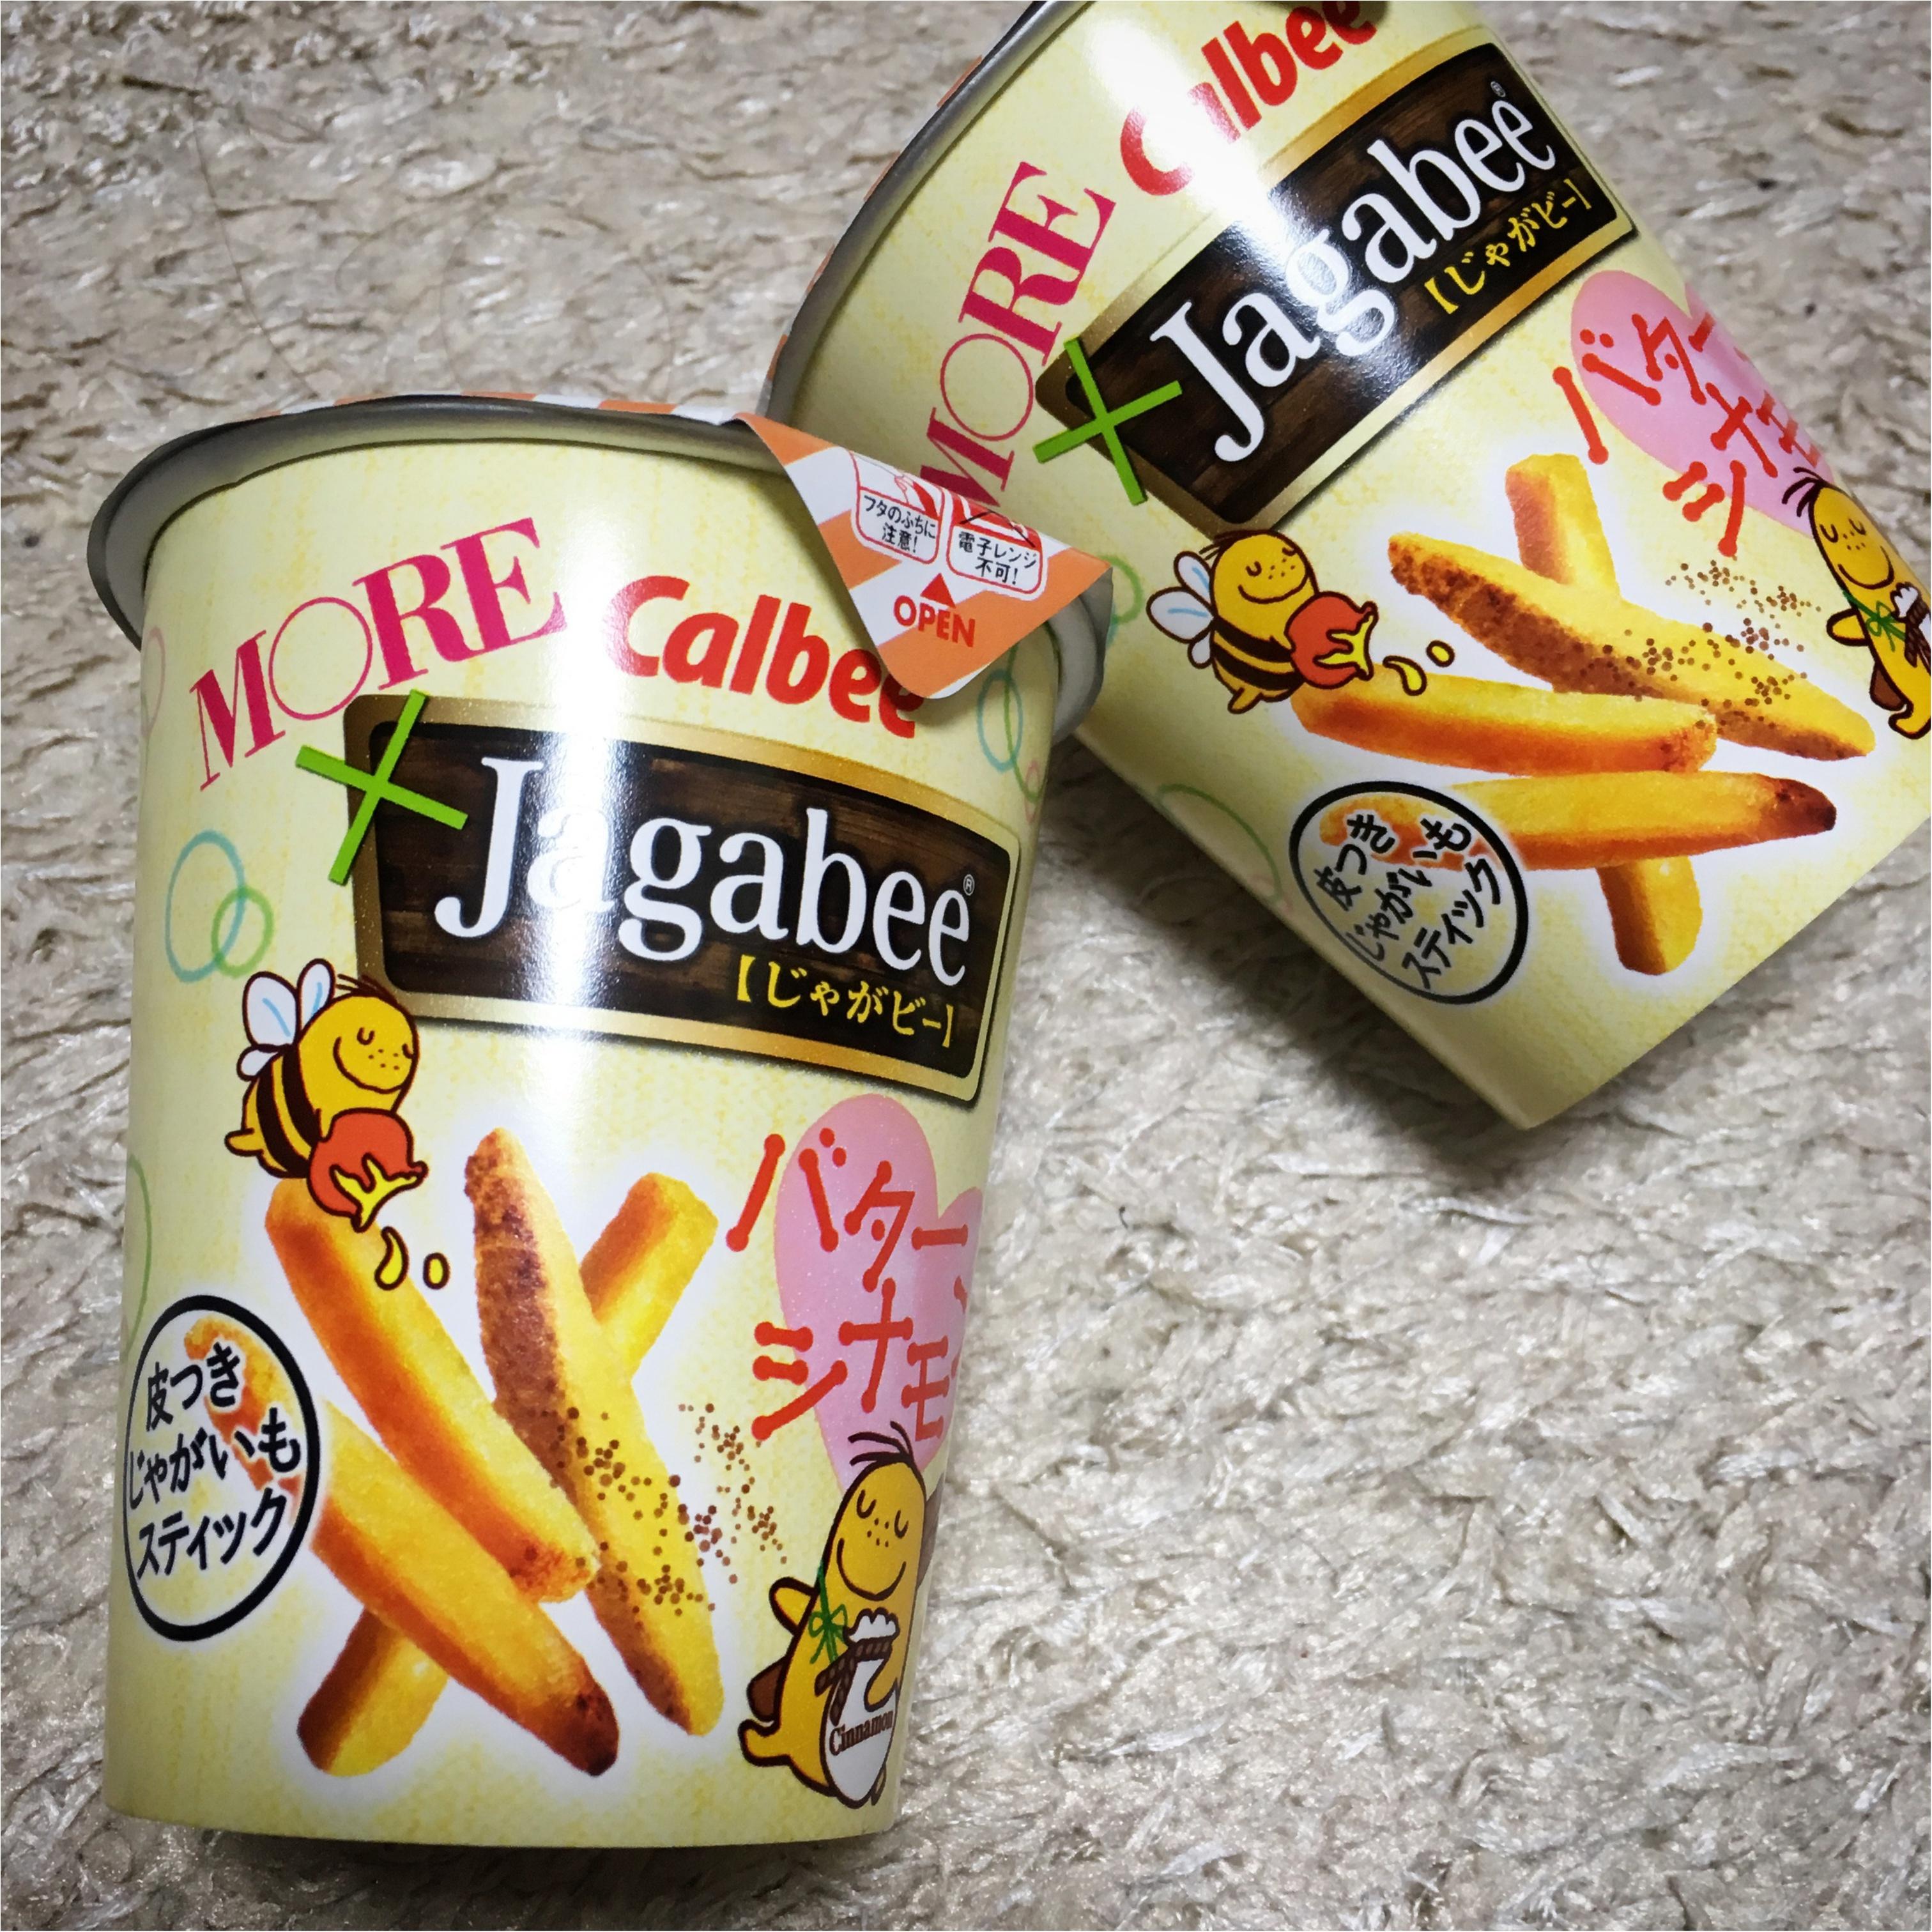 【MORE×Jagabee】シナモン好きは必見!! お仕事中のリフレッシュお菓子はスウィーツみたいなJagabeeがおすすめ♡_1